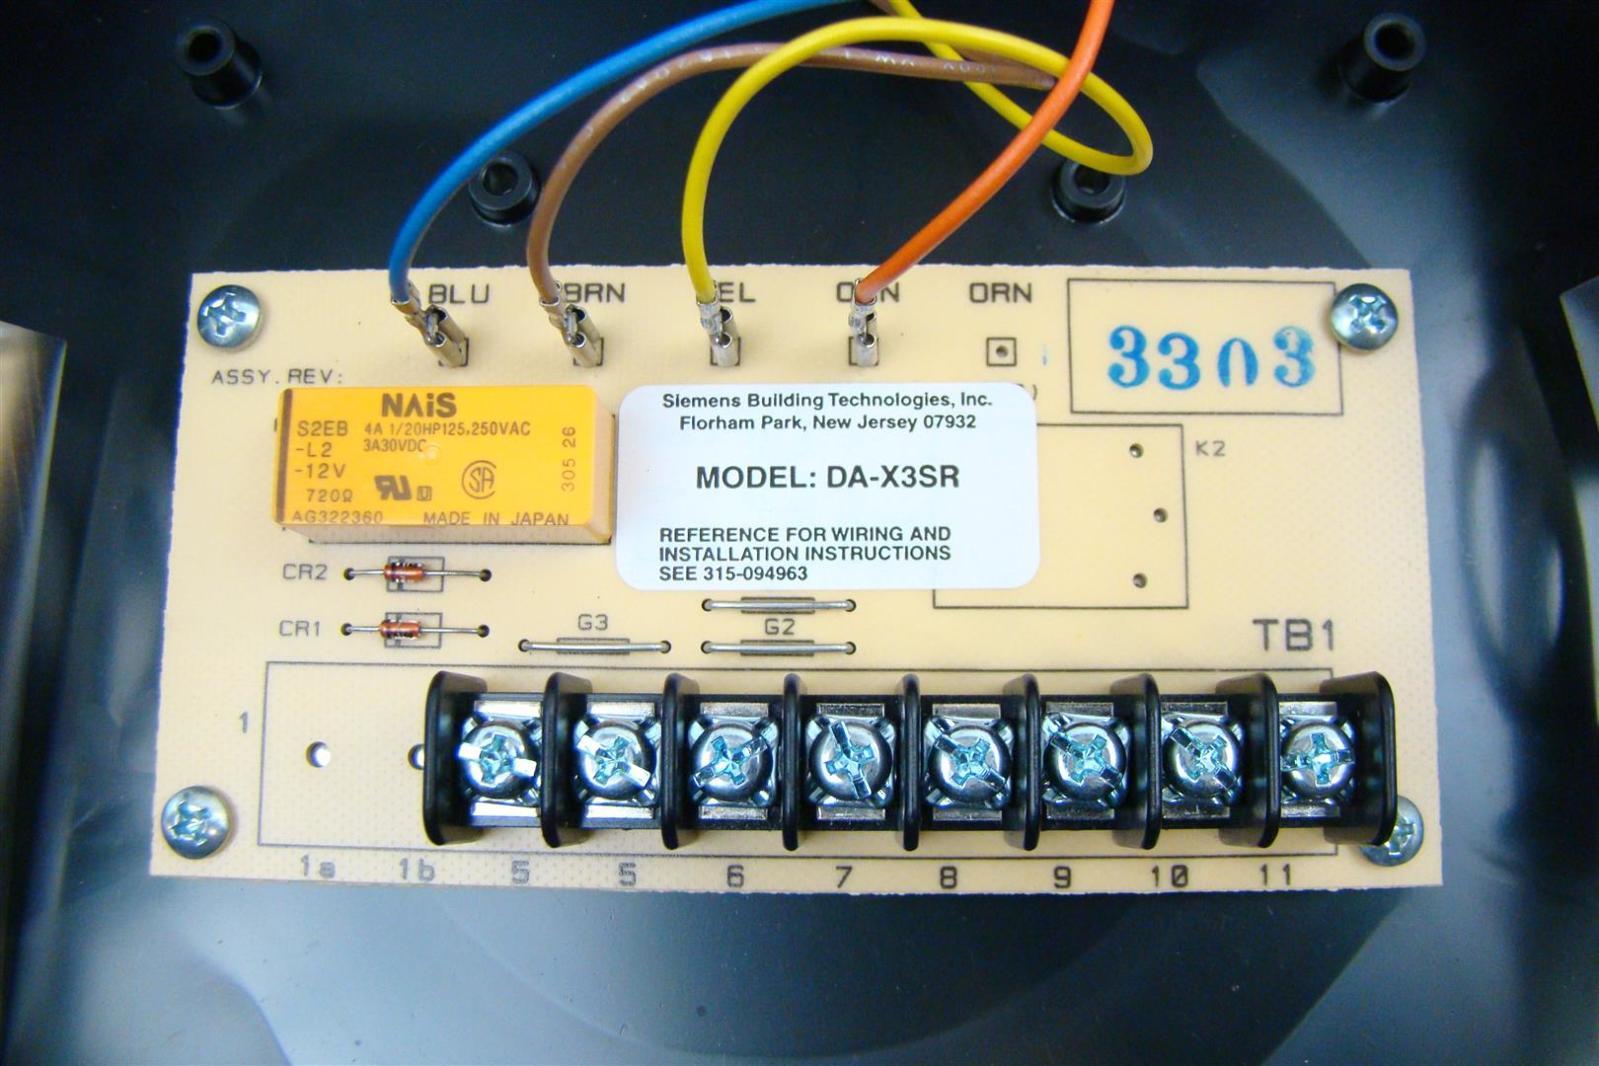 simplex 4098 9756 duct detector simplex 4098 9756 duct sensor smoke simplex clock system wiring simplex 4098 9756 wiring diagram simplex 4002 fire alarm